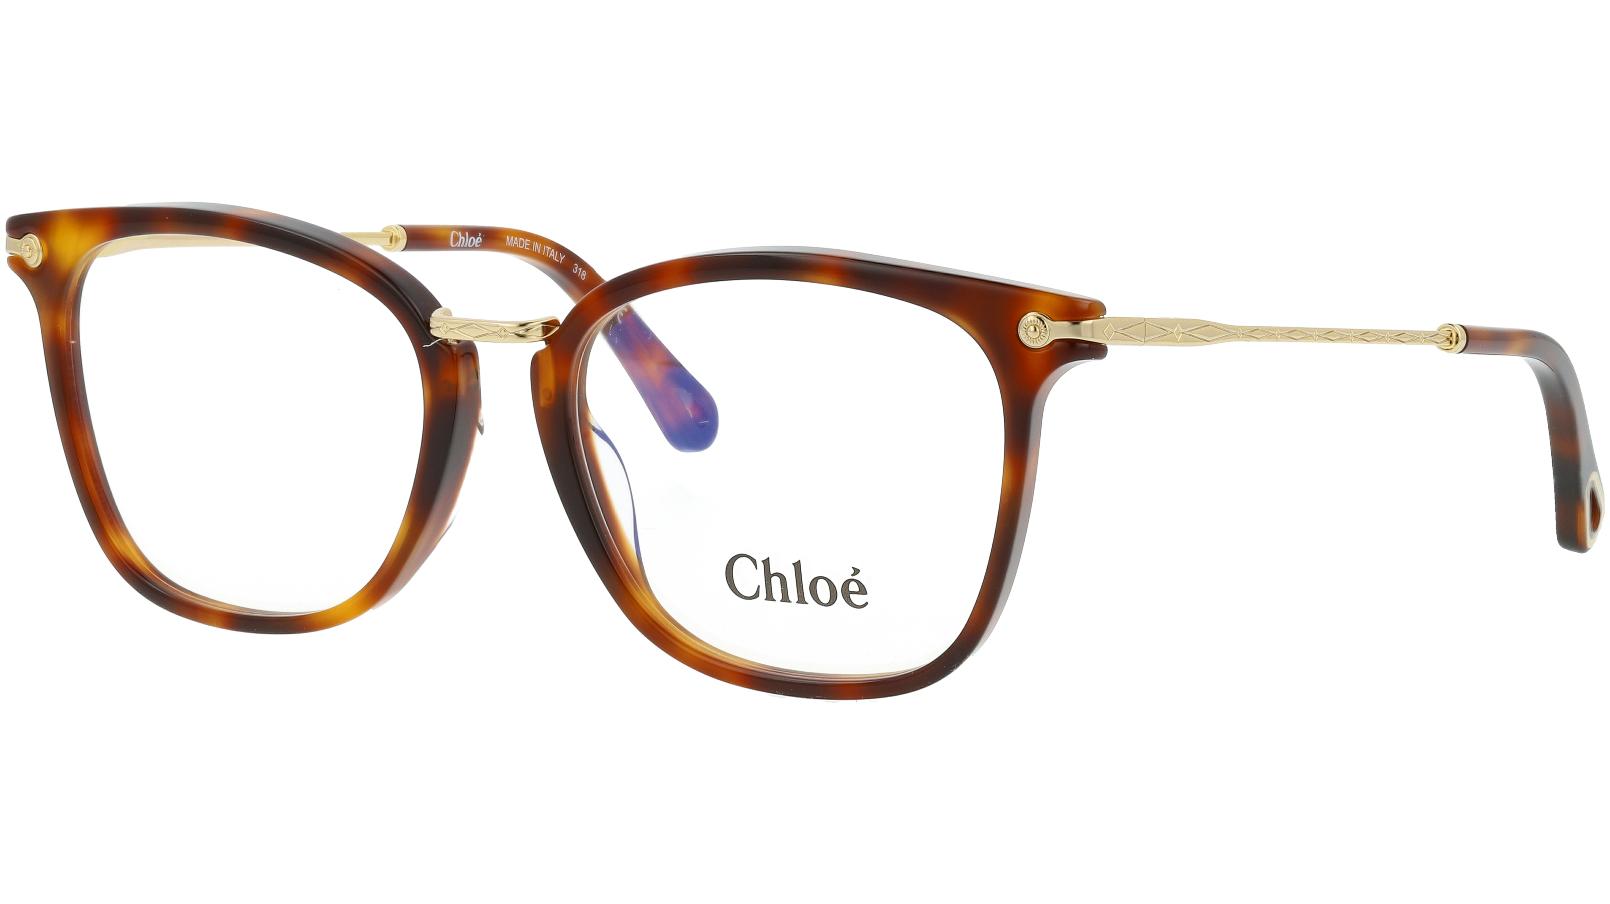 Chloé CE2734 218 53 Havana Glasses